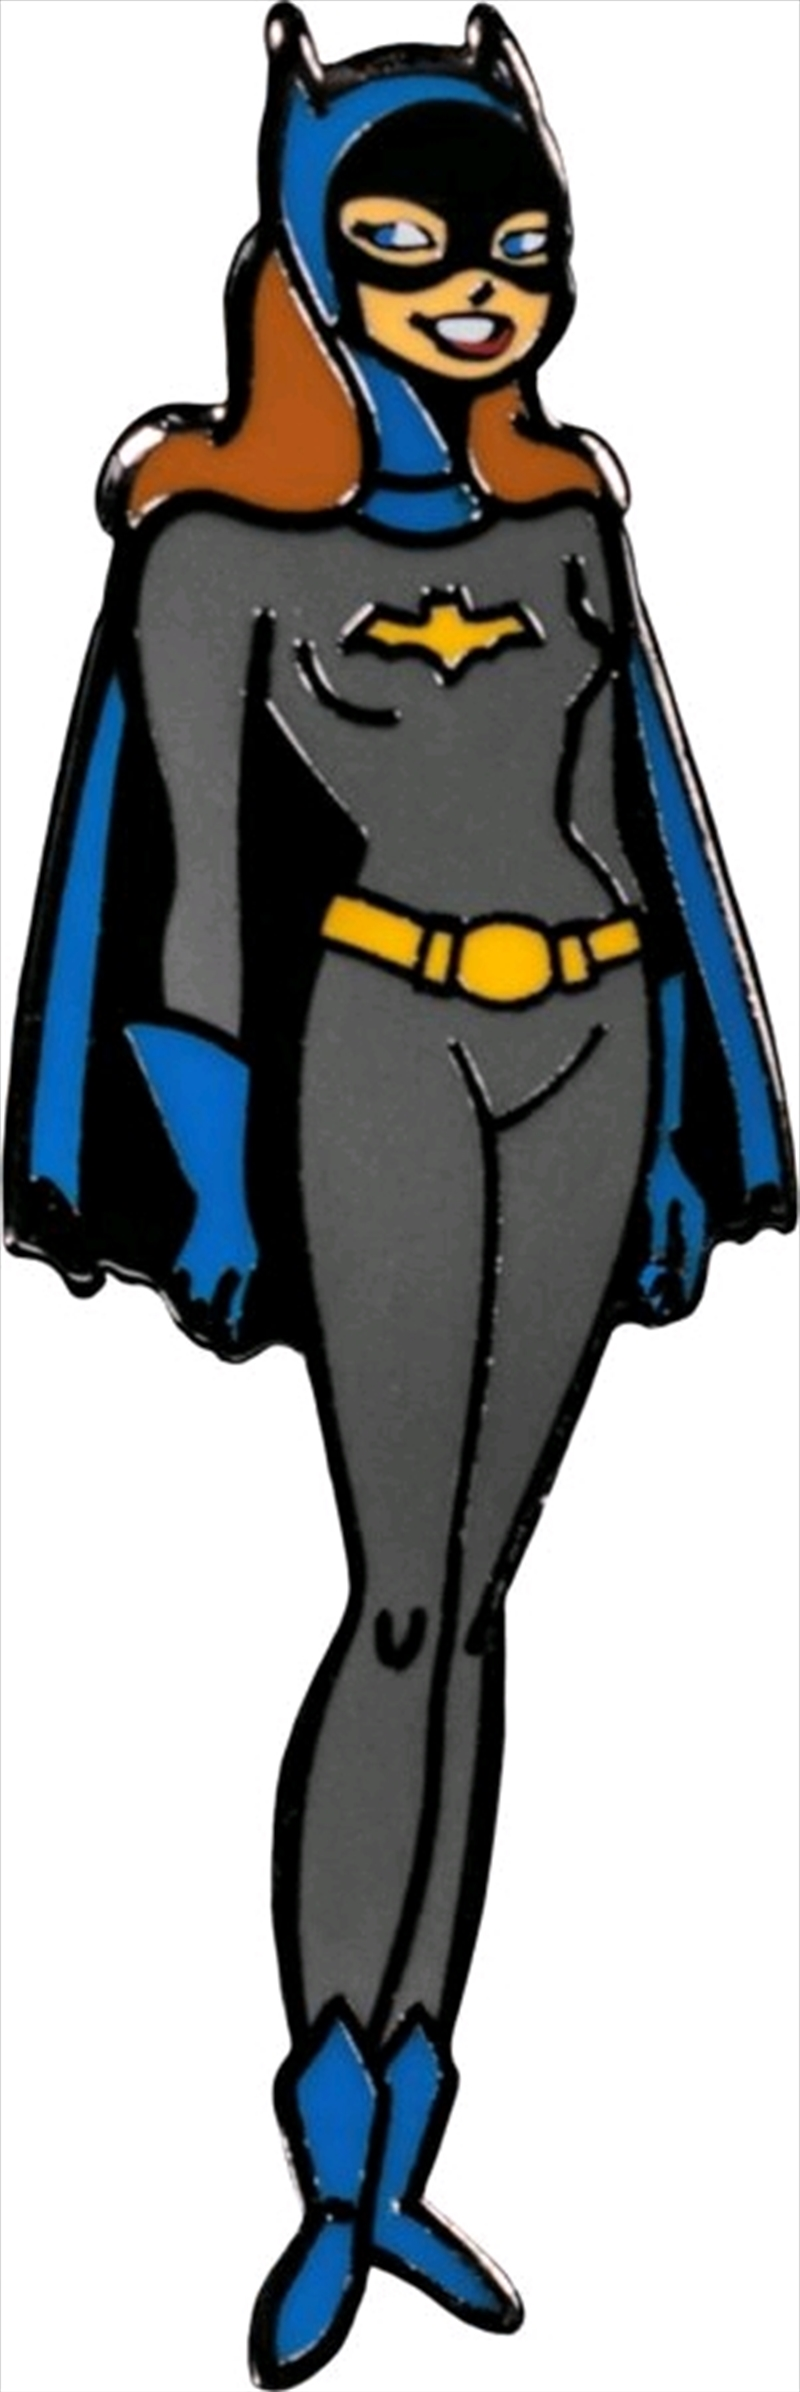 Batman:The Animated Series - Batgirl Enamel Pin | Merchandise